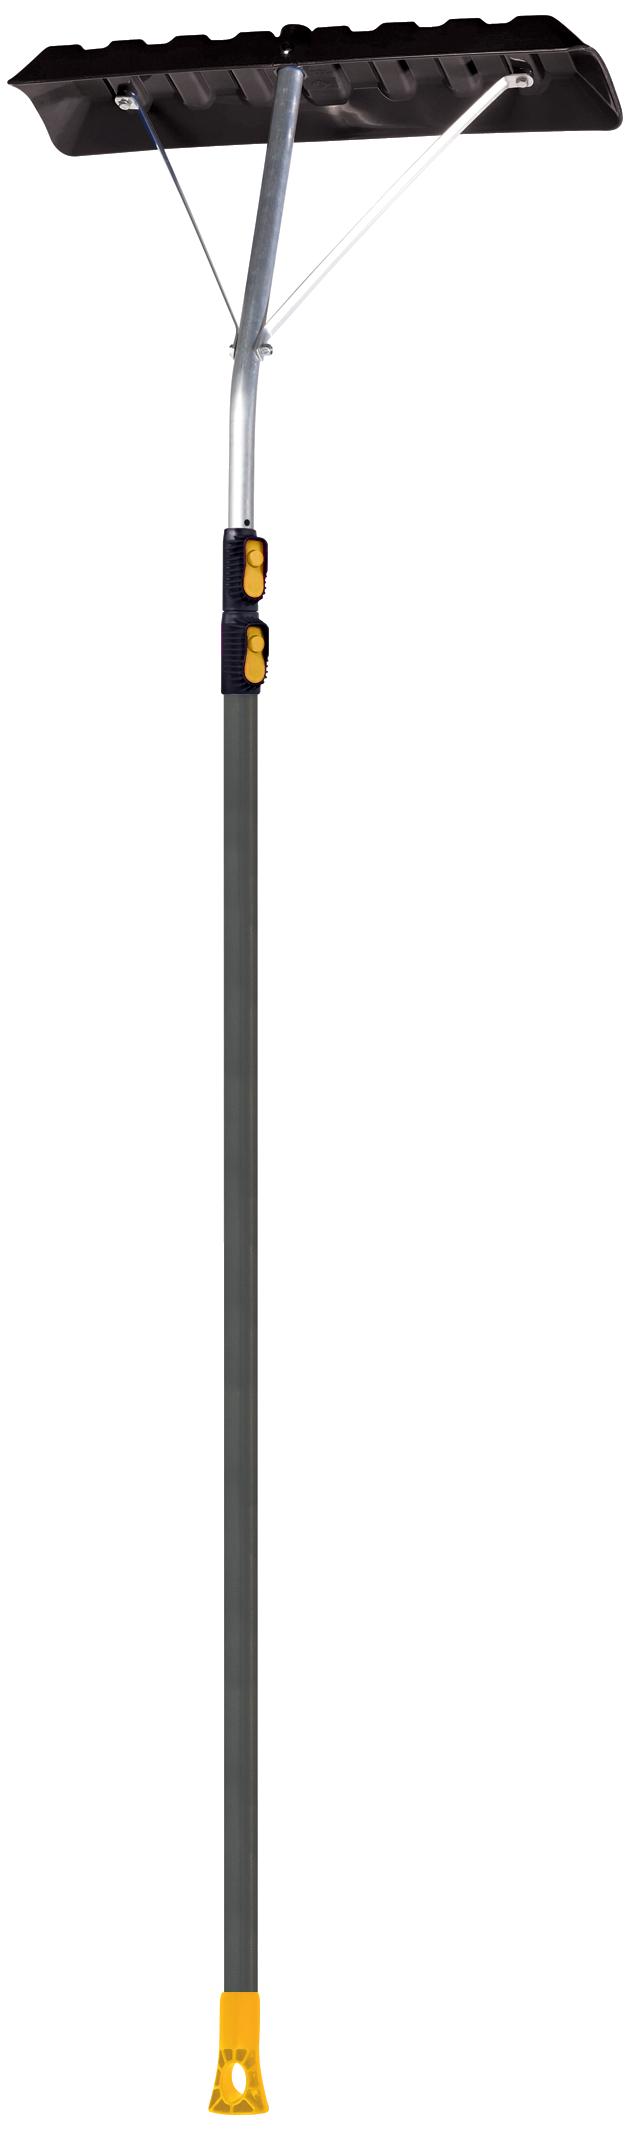 193055510_L_01